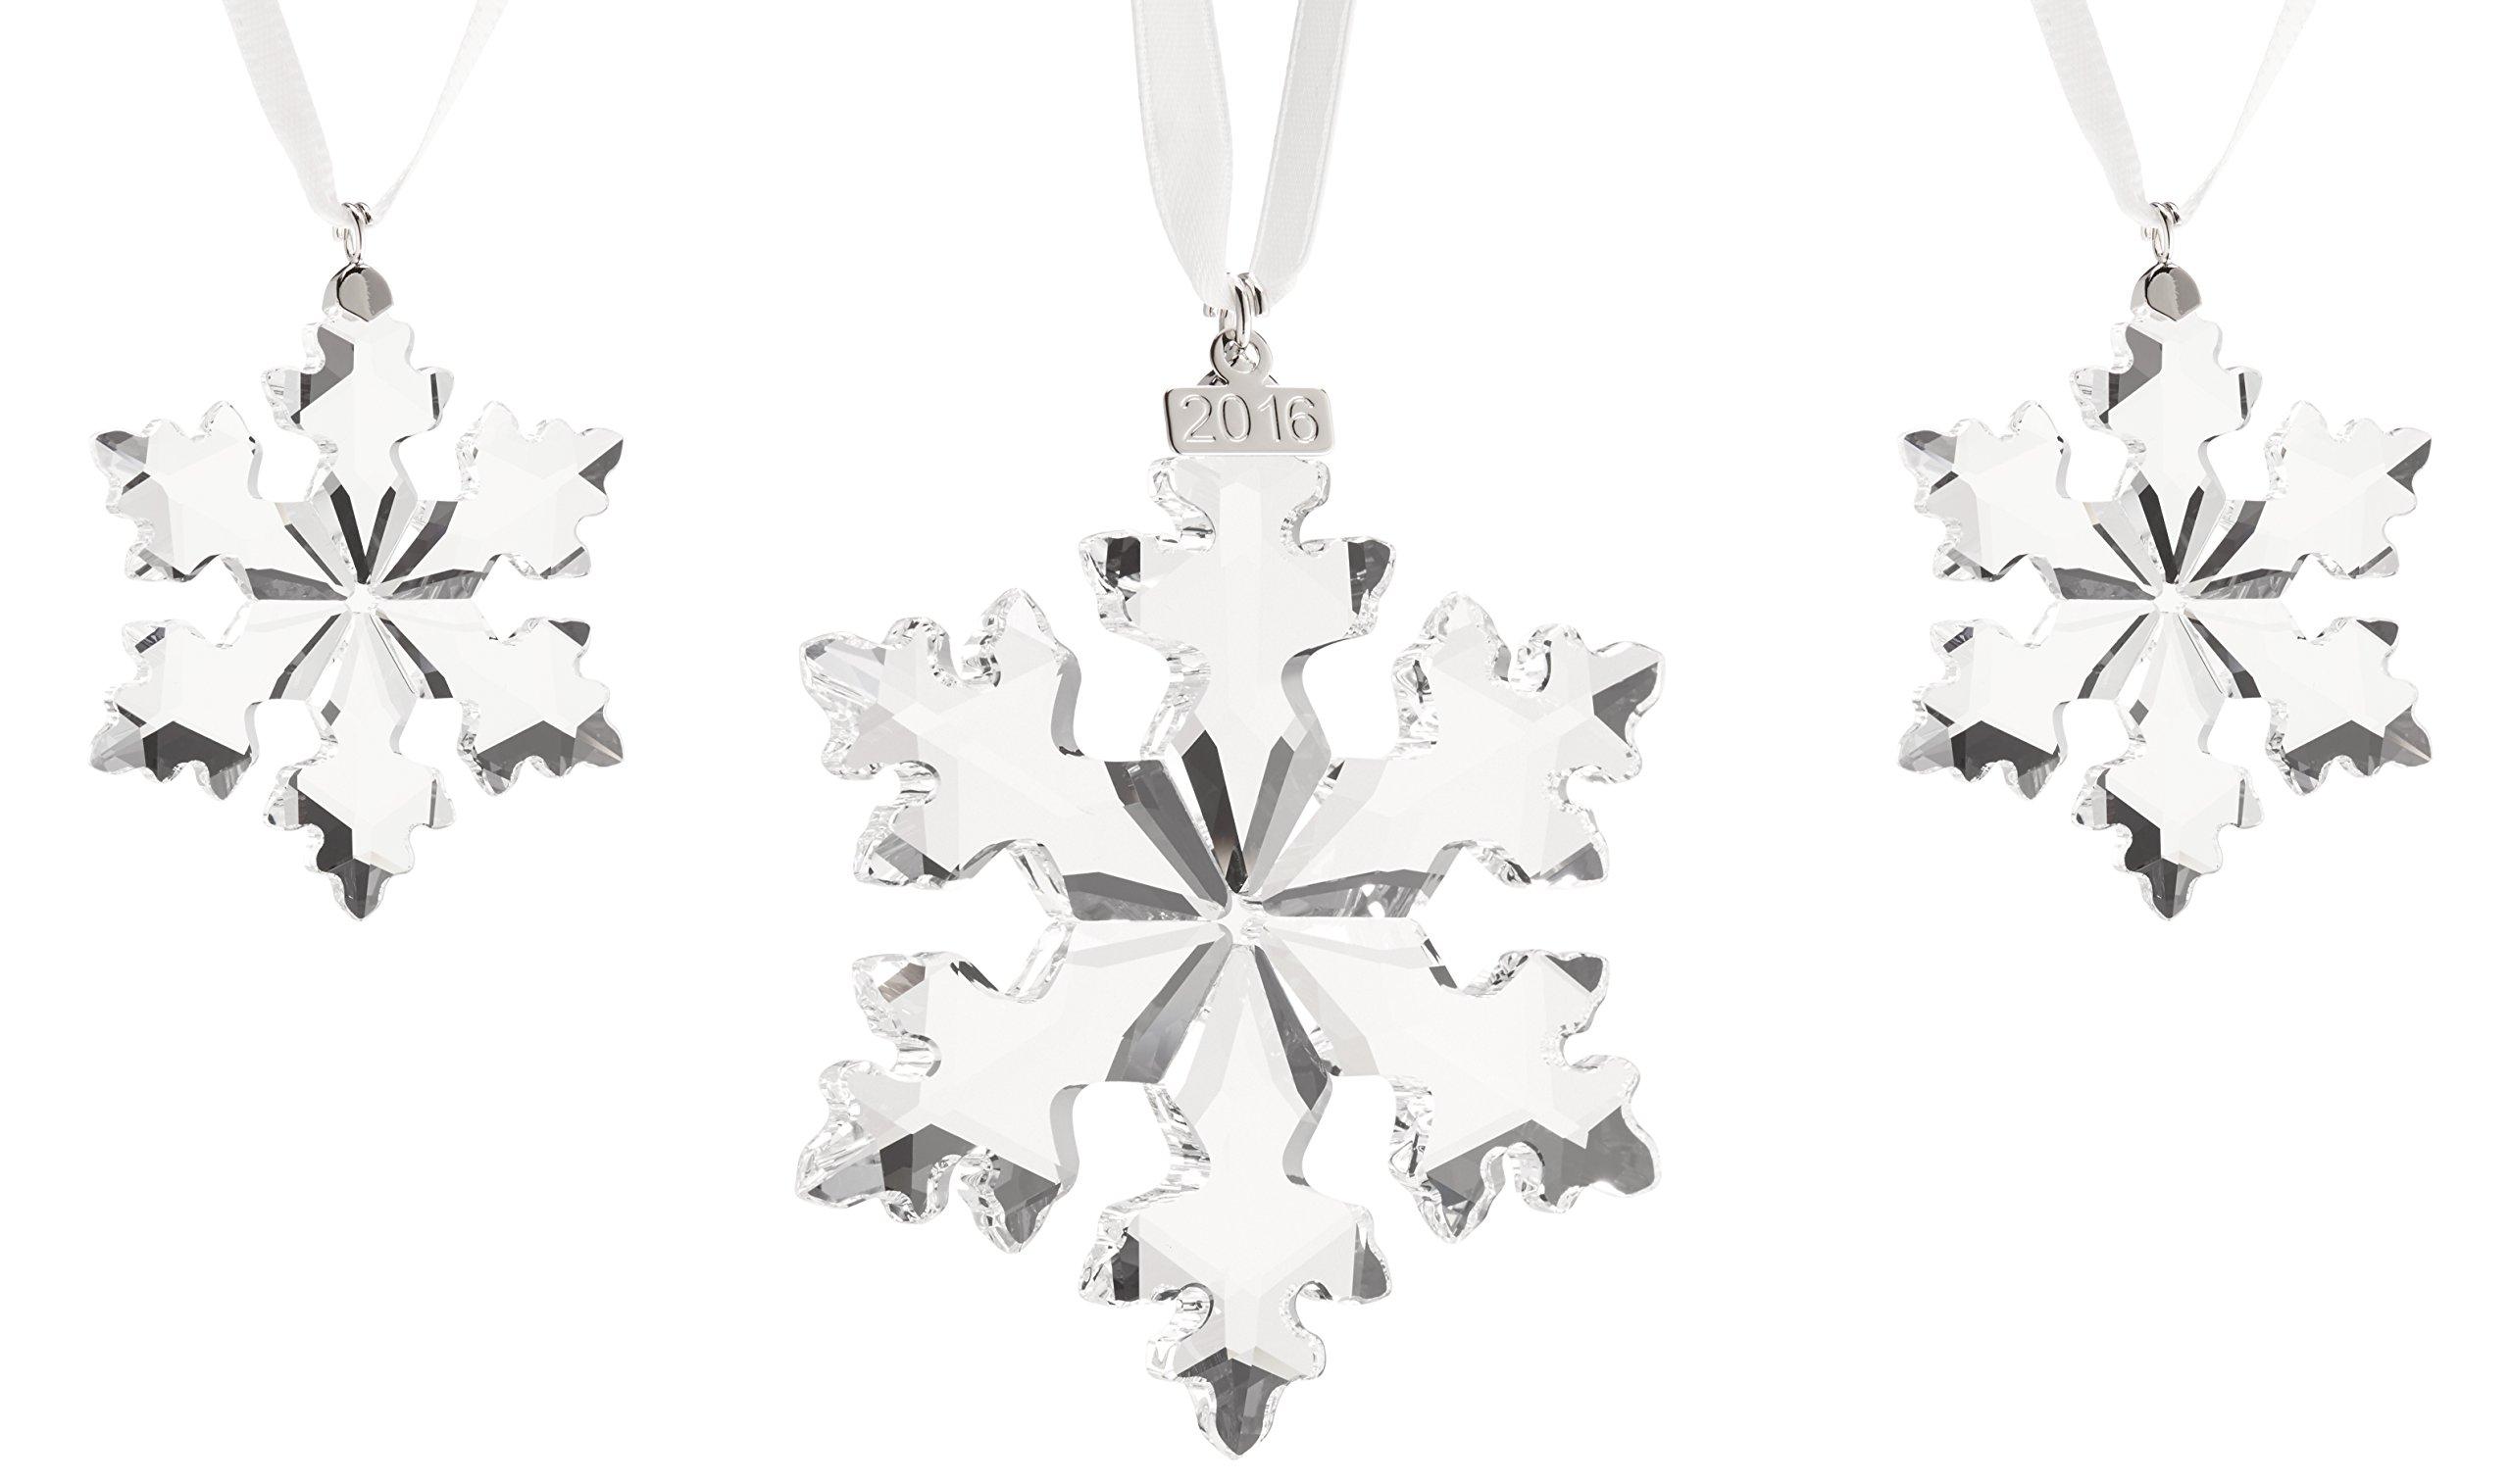 Swarovski 3-Piece Christmas Ornament Set, Limited Edition 2016